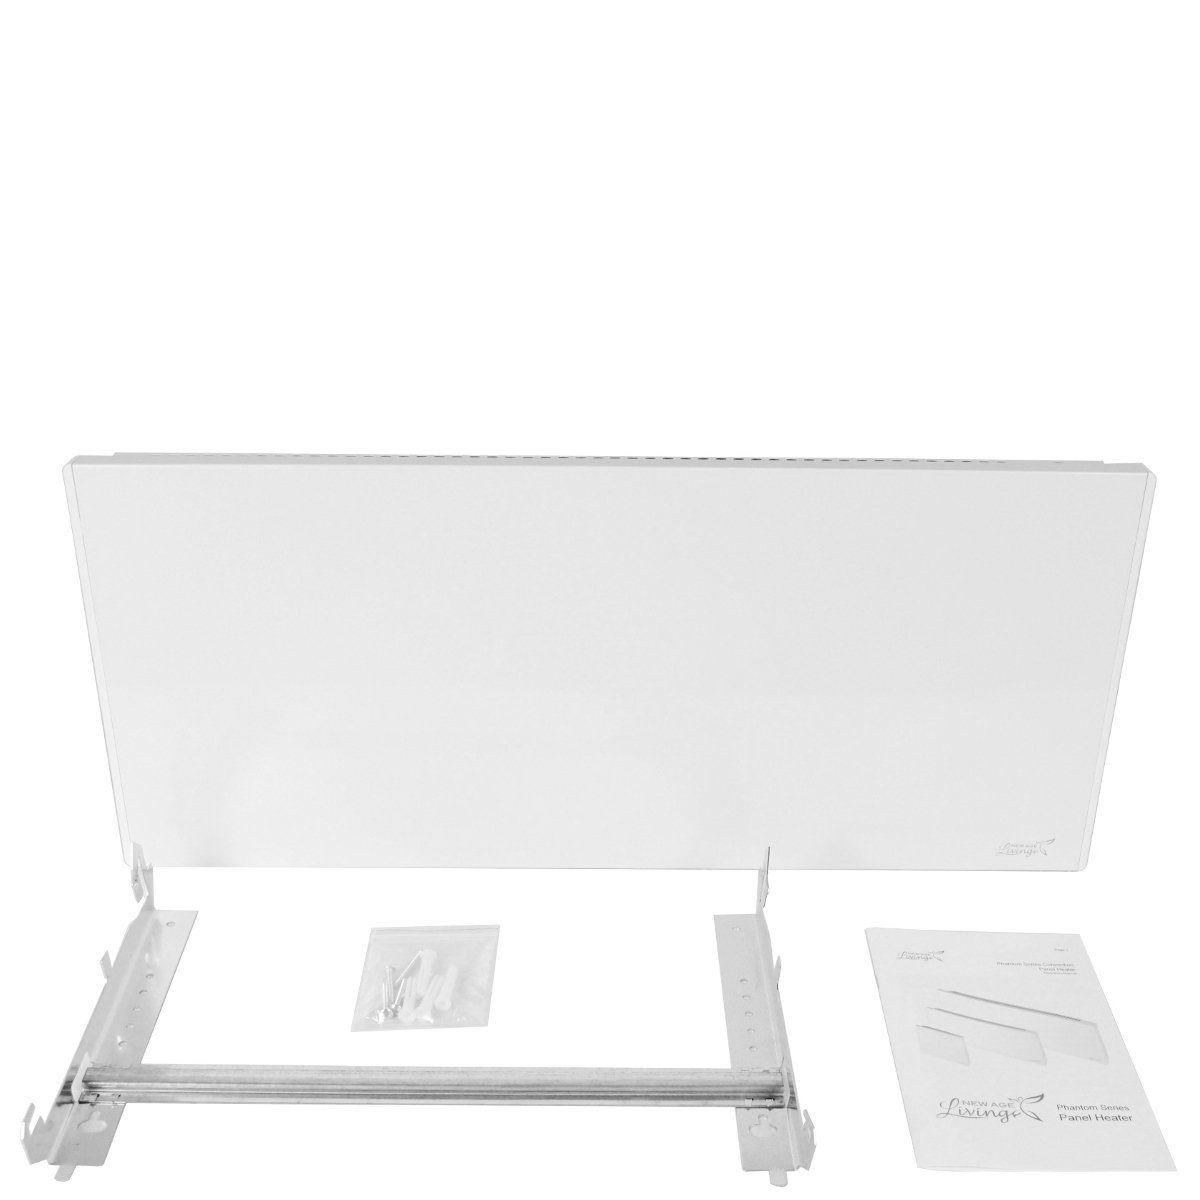 New Age Living Phantom 10 Wall Panel Heater 750w Radiant